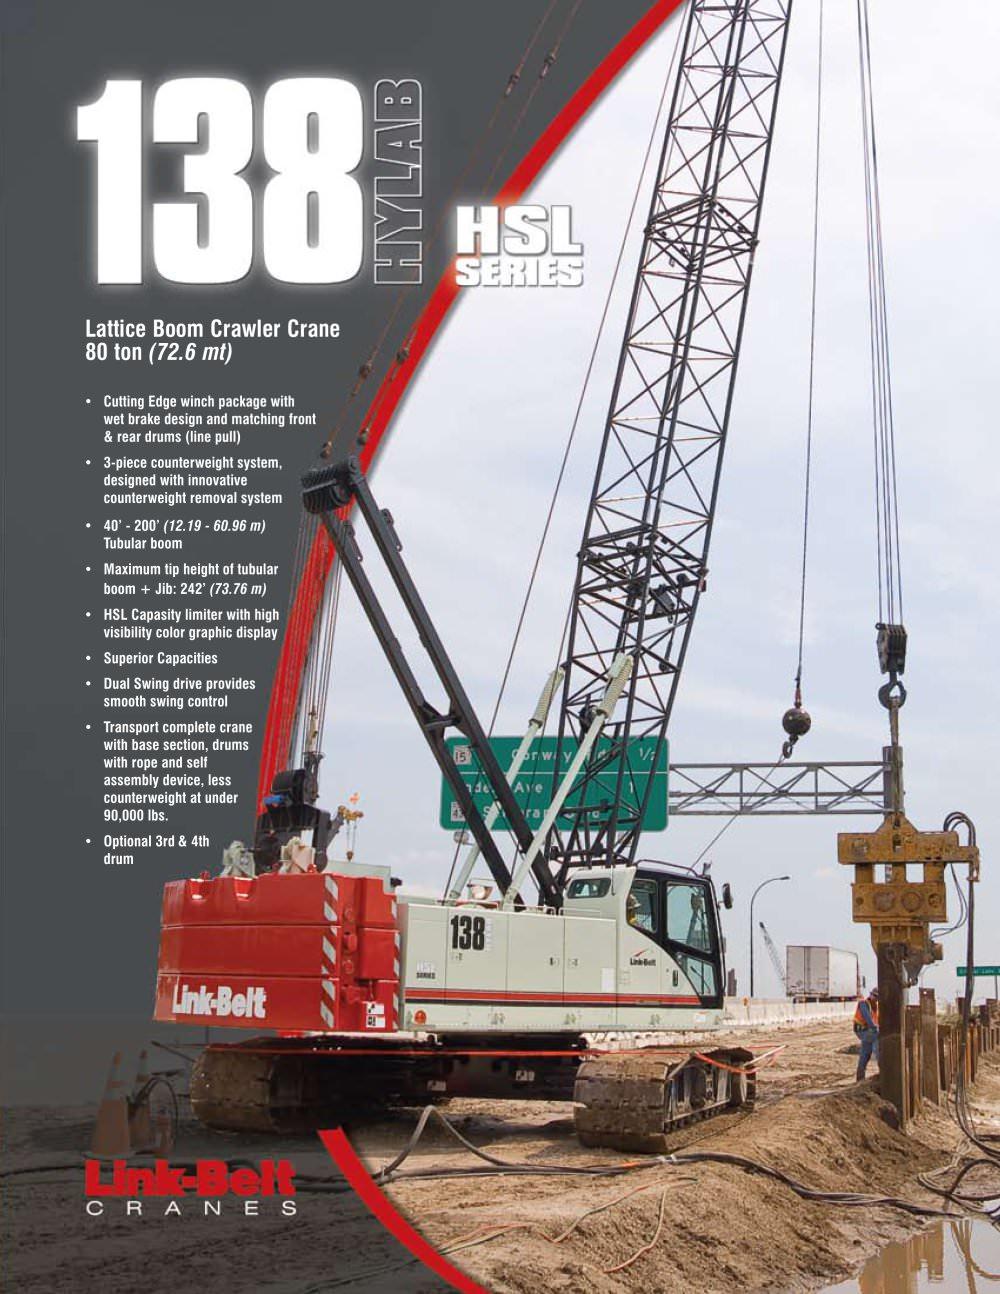 138 hsl 80 ton 77 62 mt lattice boom crawler crane link belt rh pdf directindustry com Link Belt Crane Specifications Link Belt